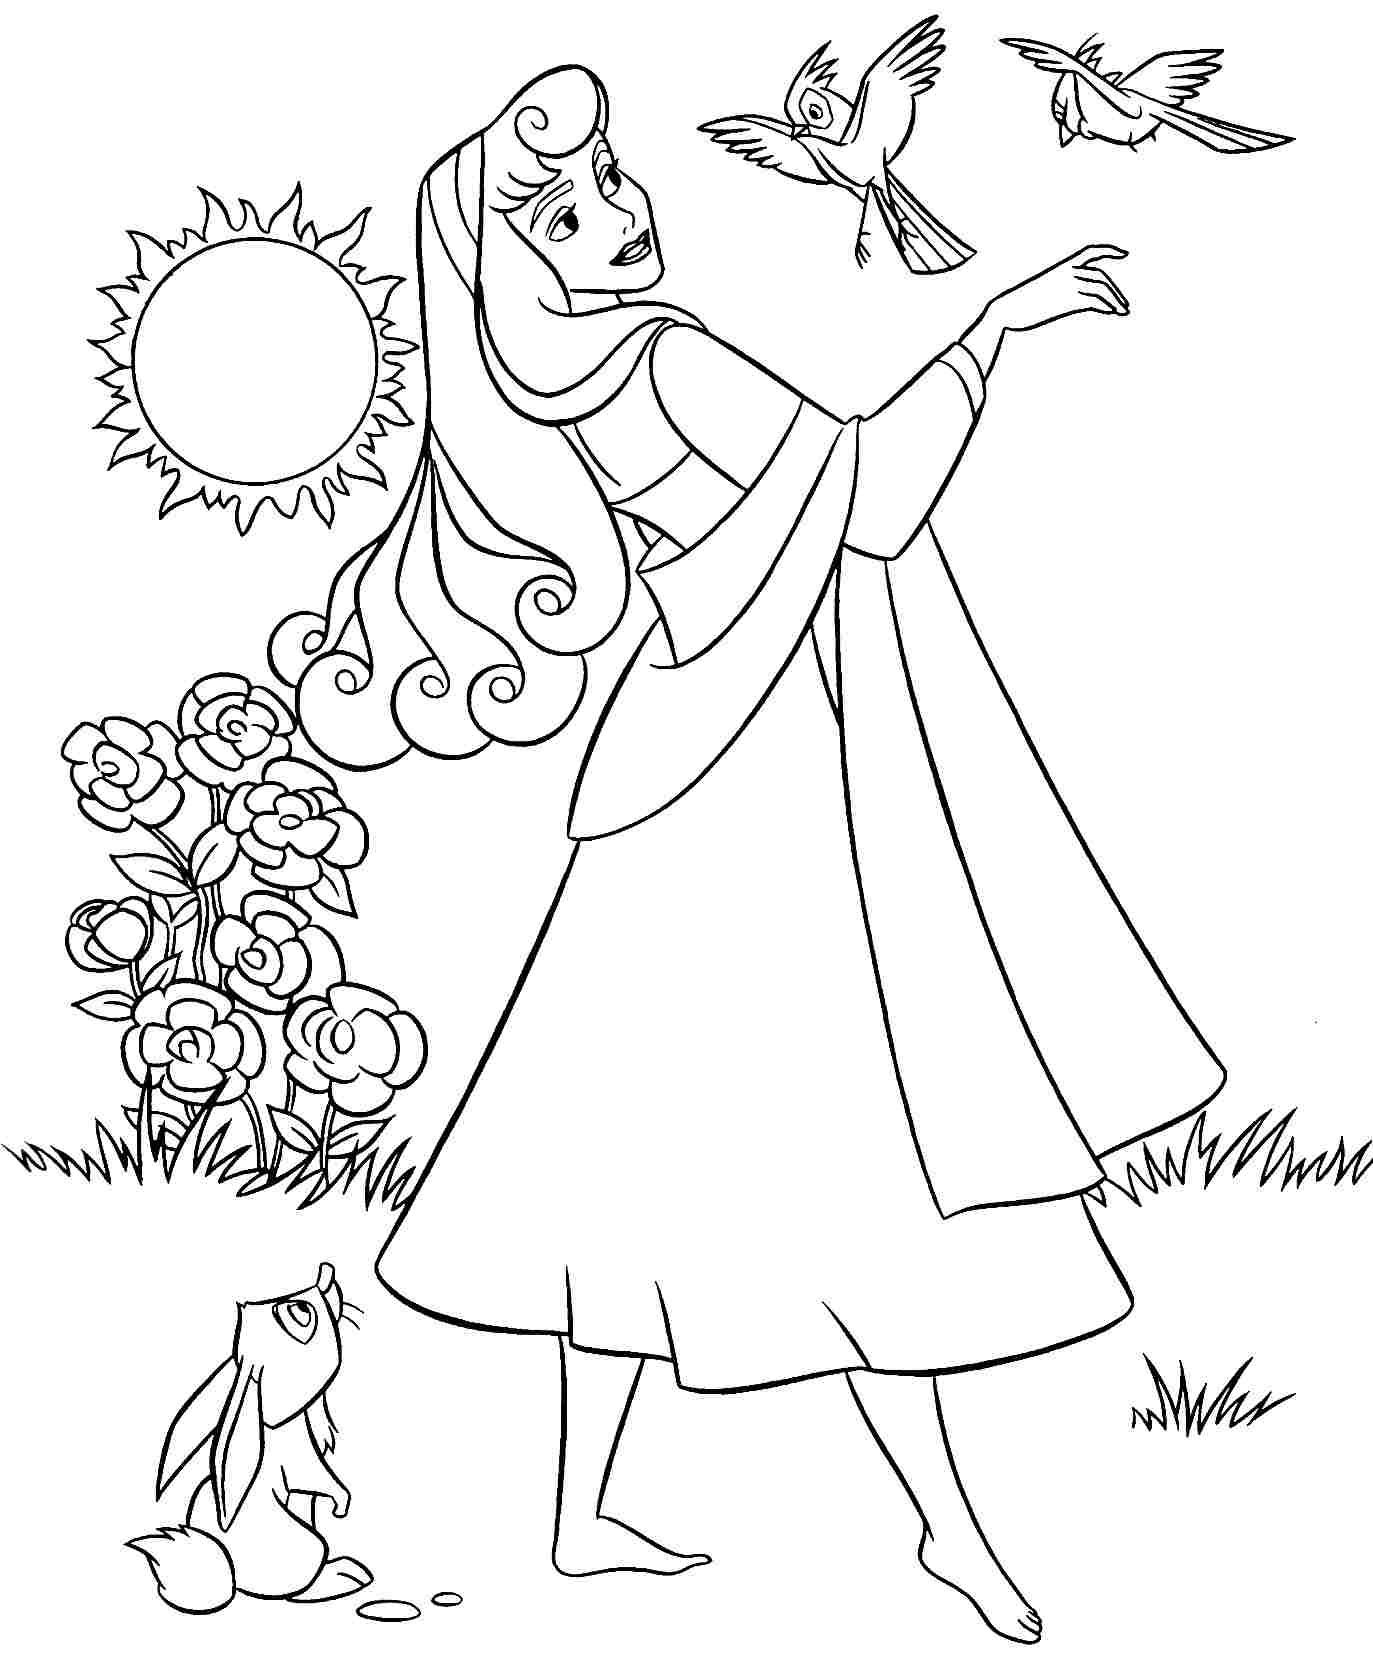 Ariel Aurora Sleeping Beauty Ariel Aurora Disney Princess Coloring Pages All Round Hobby